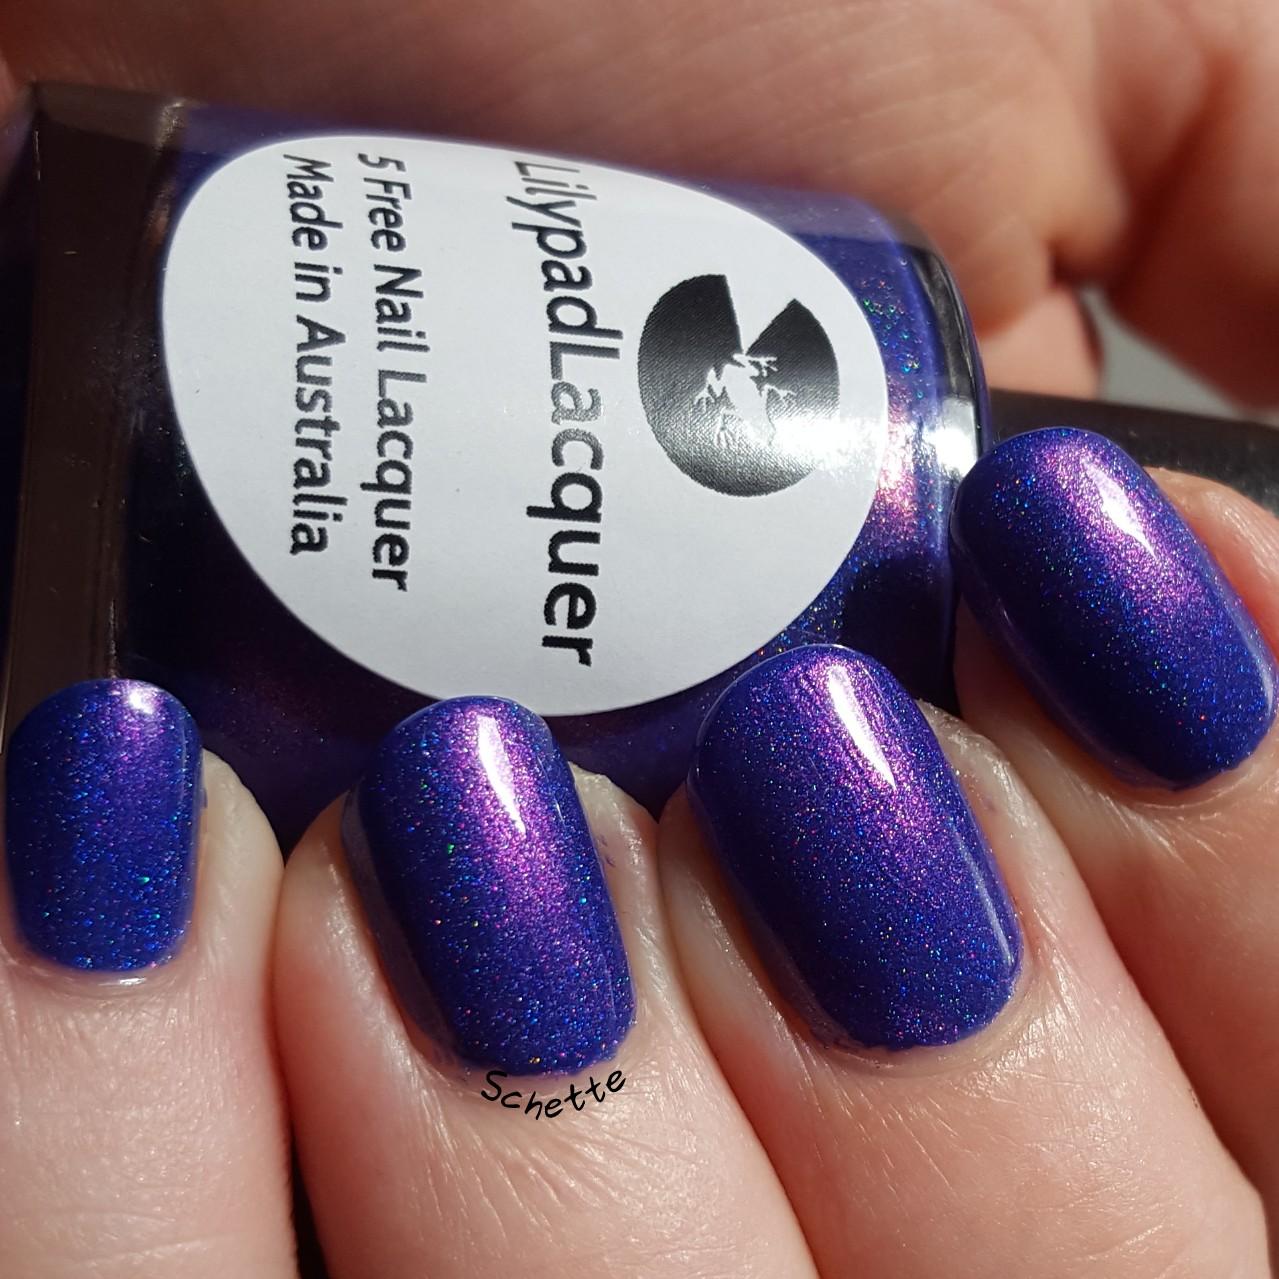 Lilypad Lacquer - Supernatural